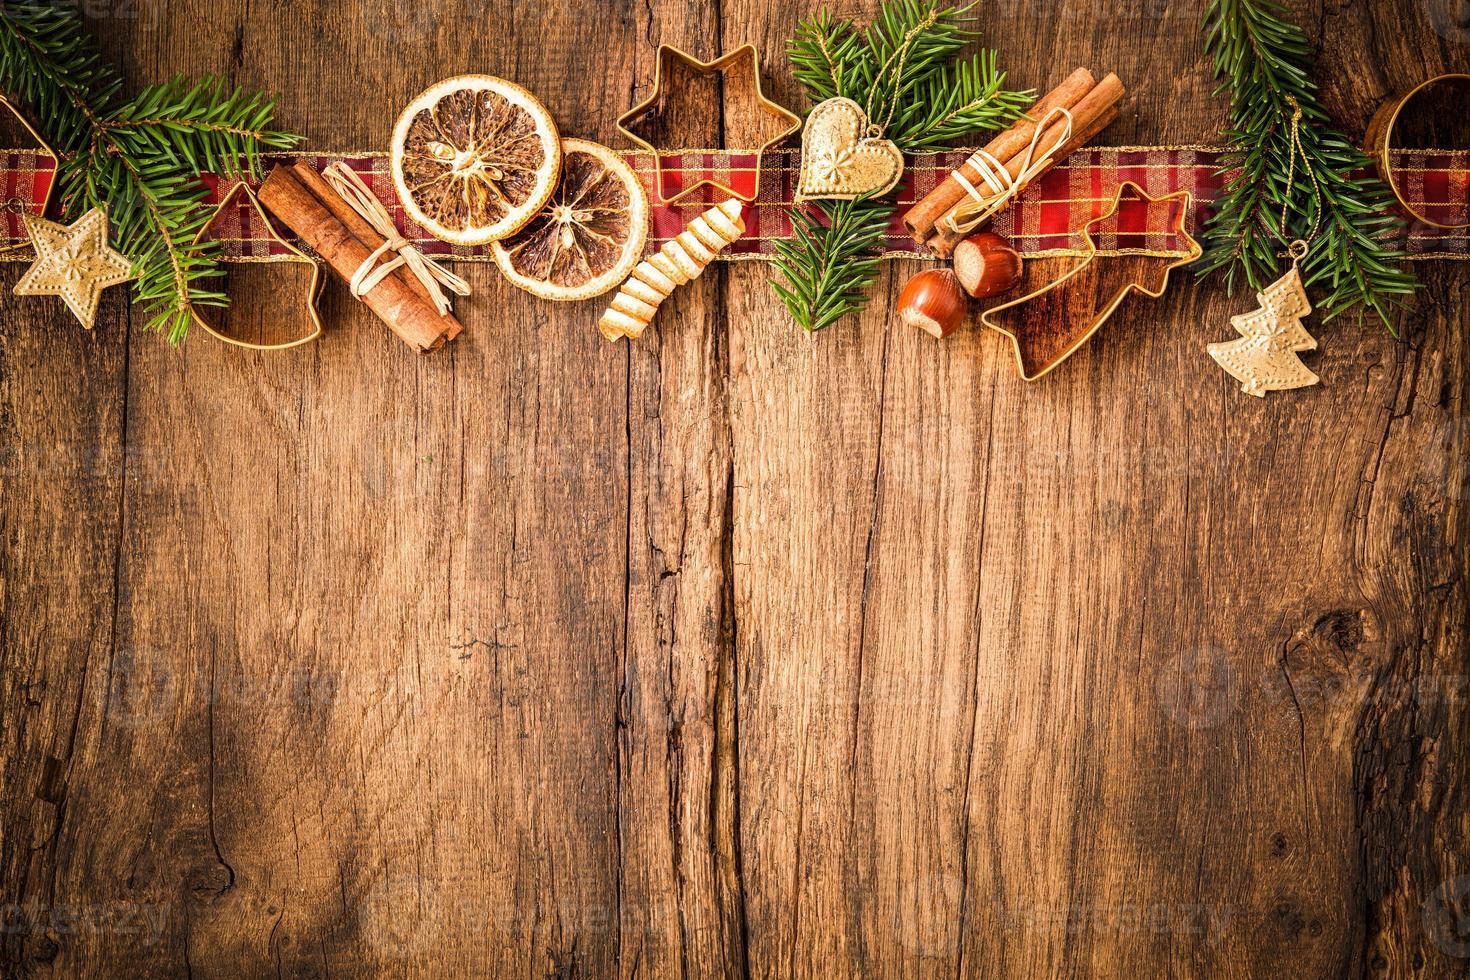 especiarias para bolos de natal foto